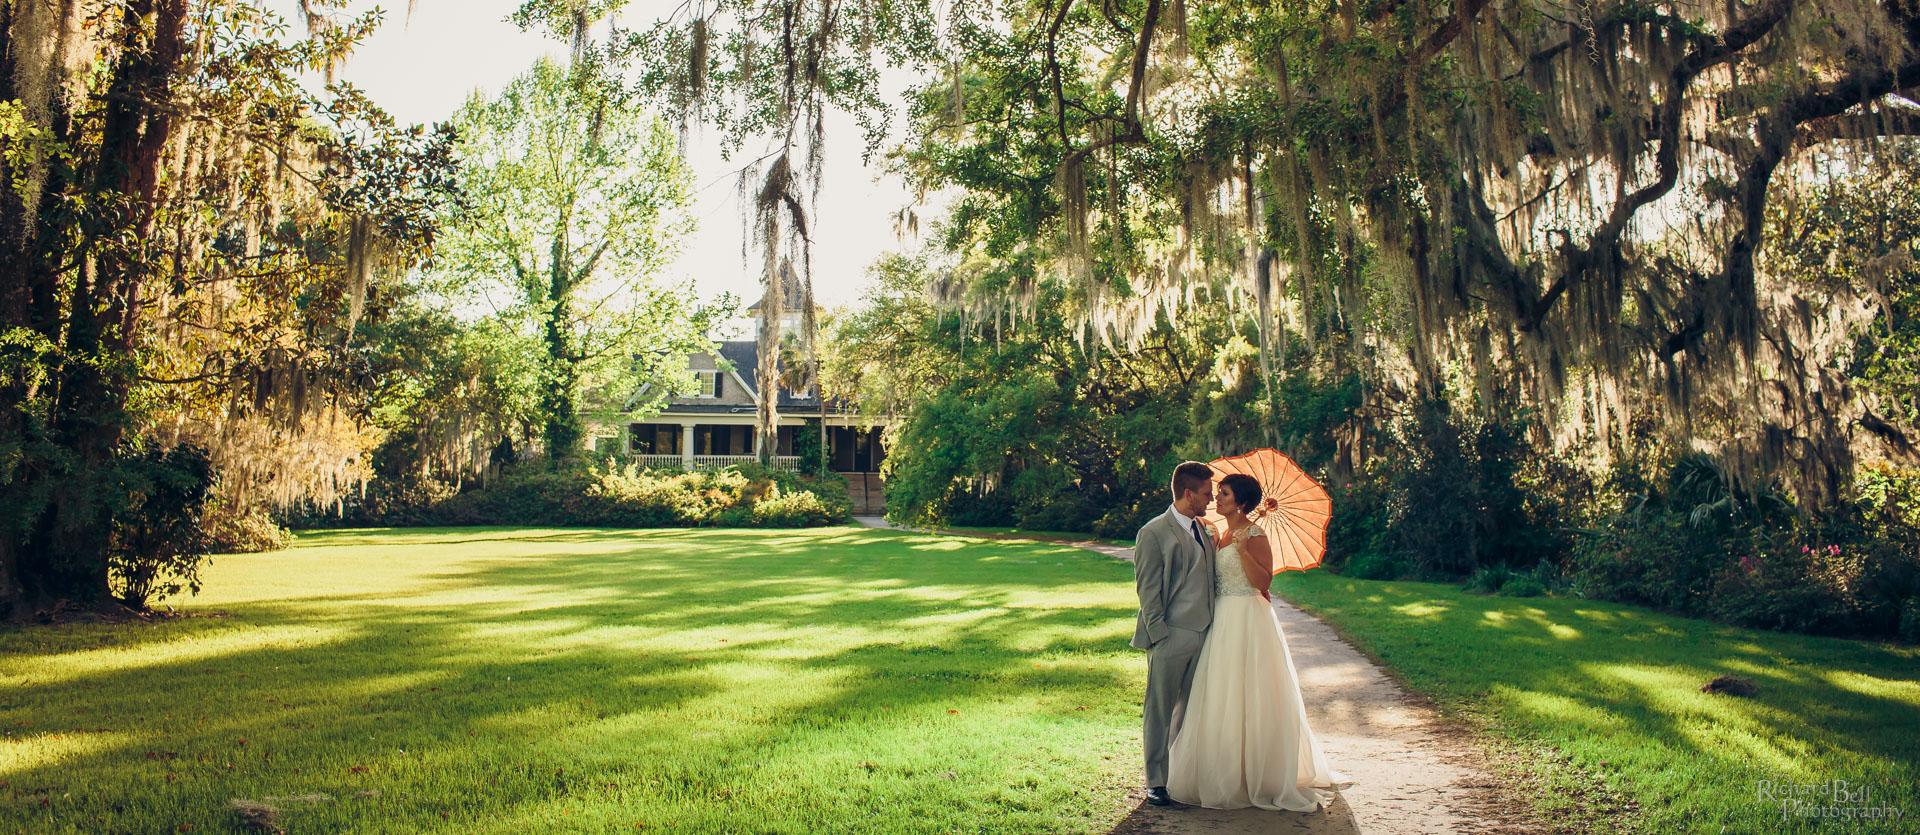 Bride and Groom at Magnolia